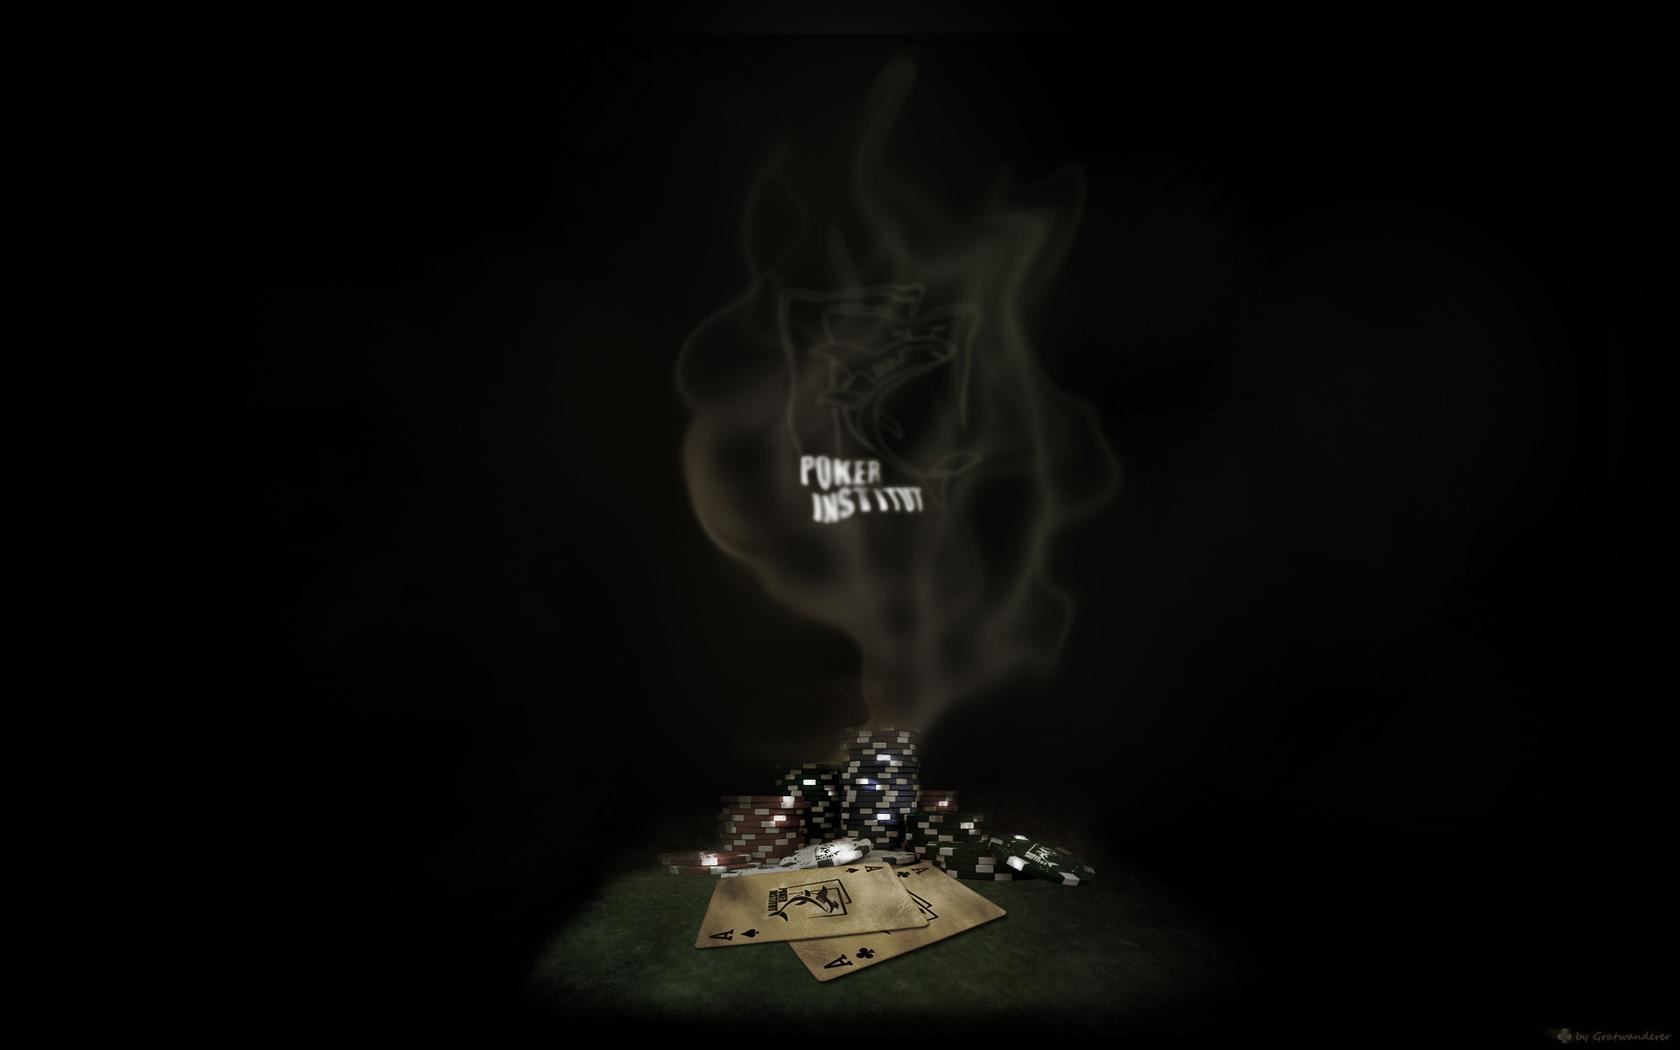 poker resimleri hd wallpapers - photo #3